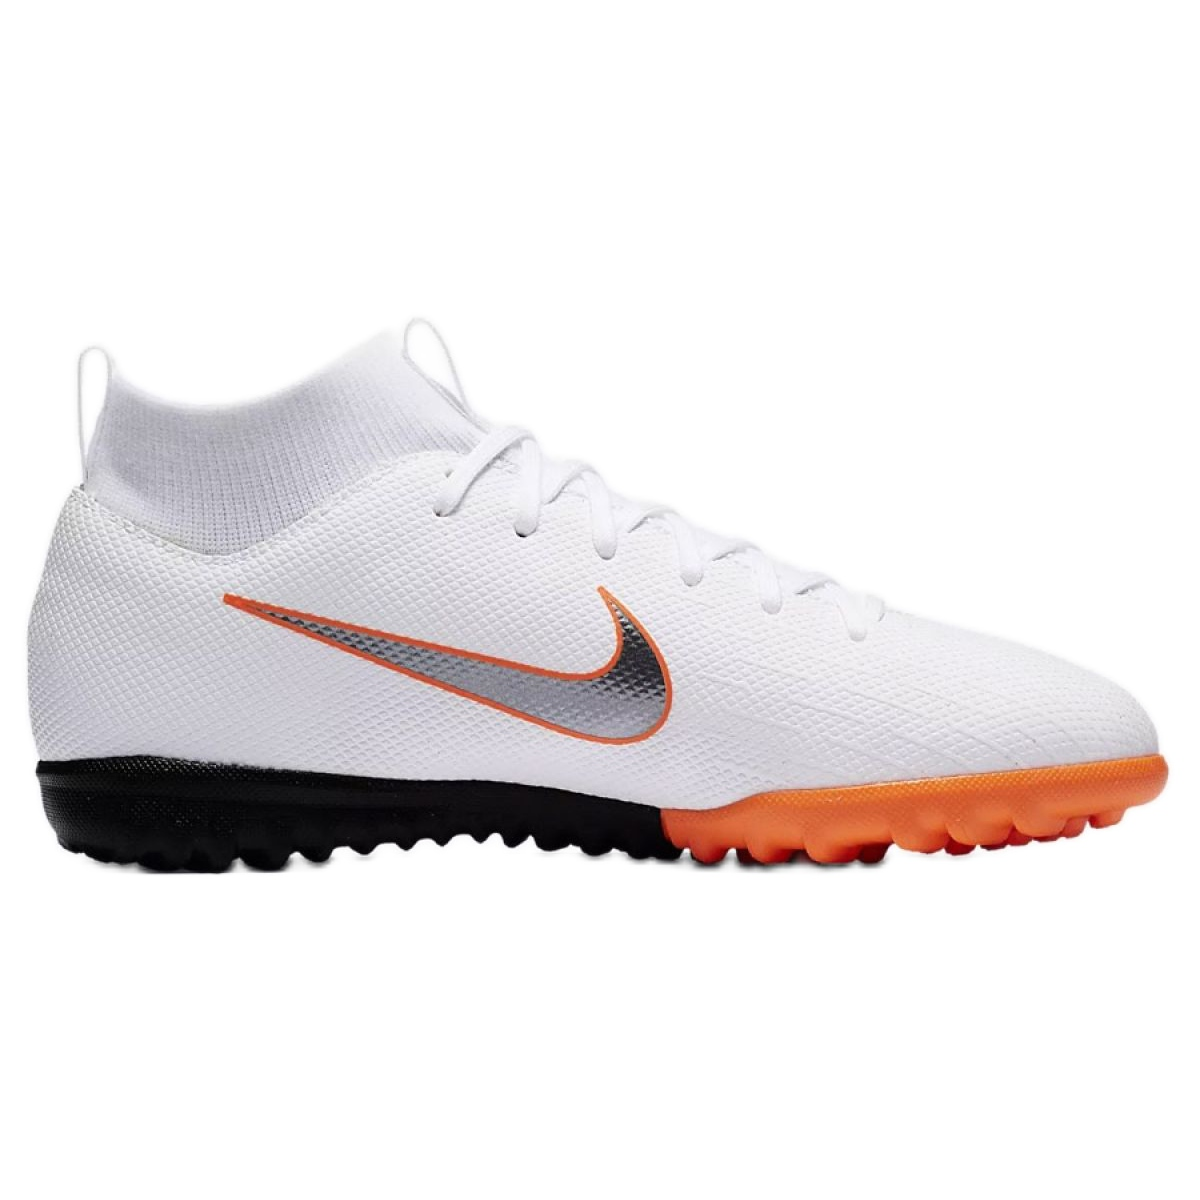 Academia Nike Mercurial SuperflyX 6 Gs Tf Jr AH7344 107 branco branco